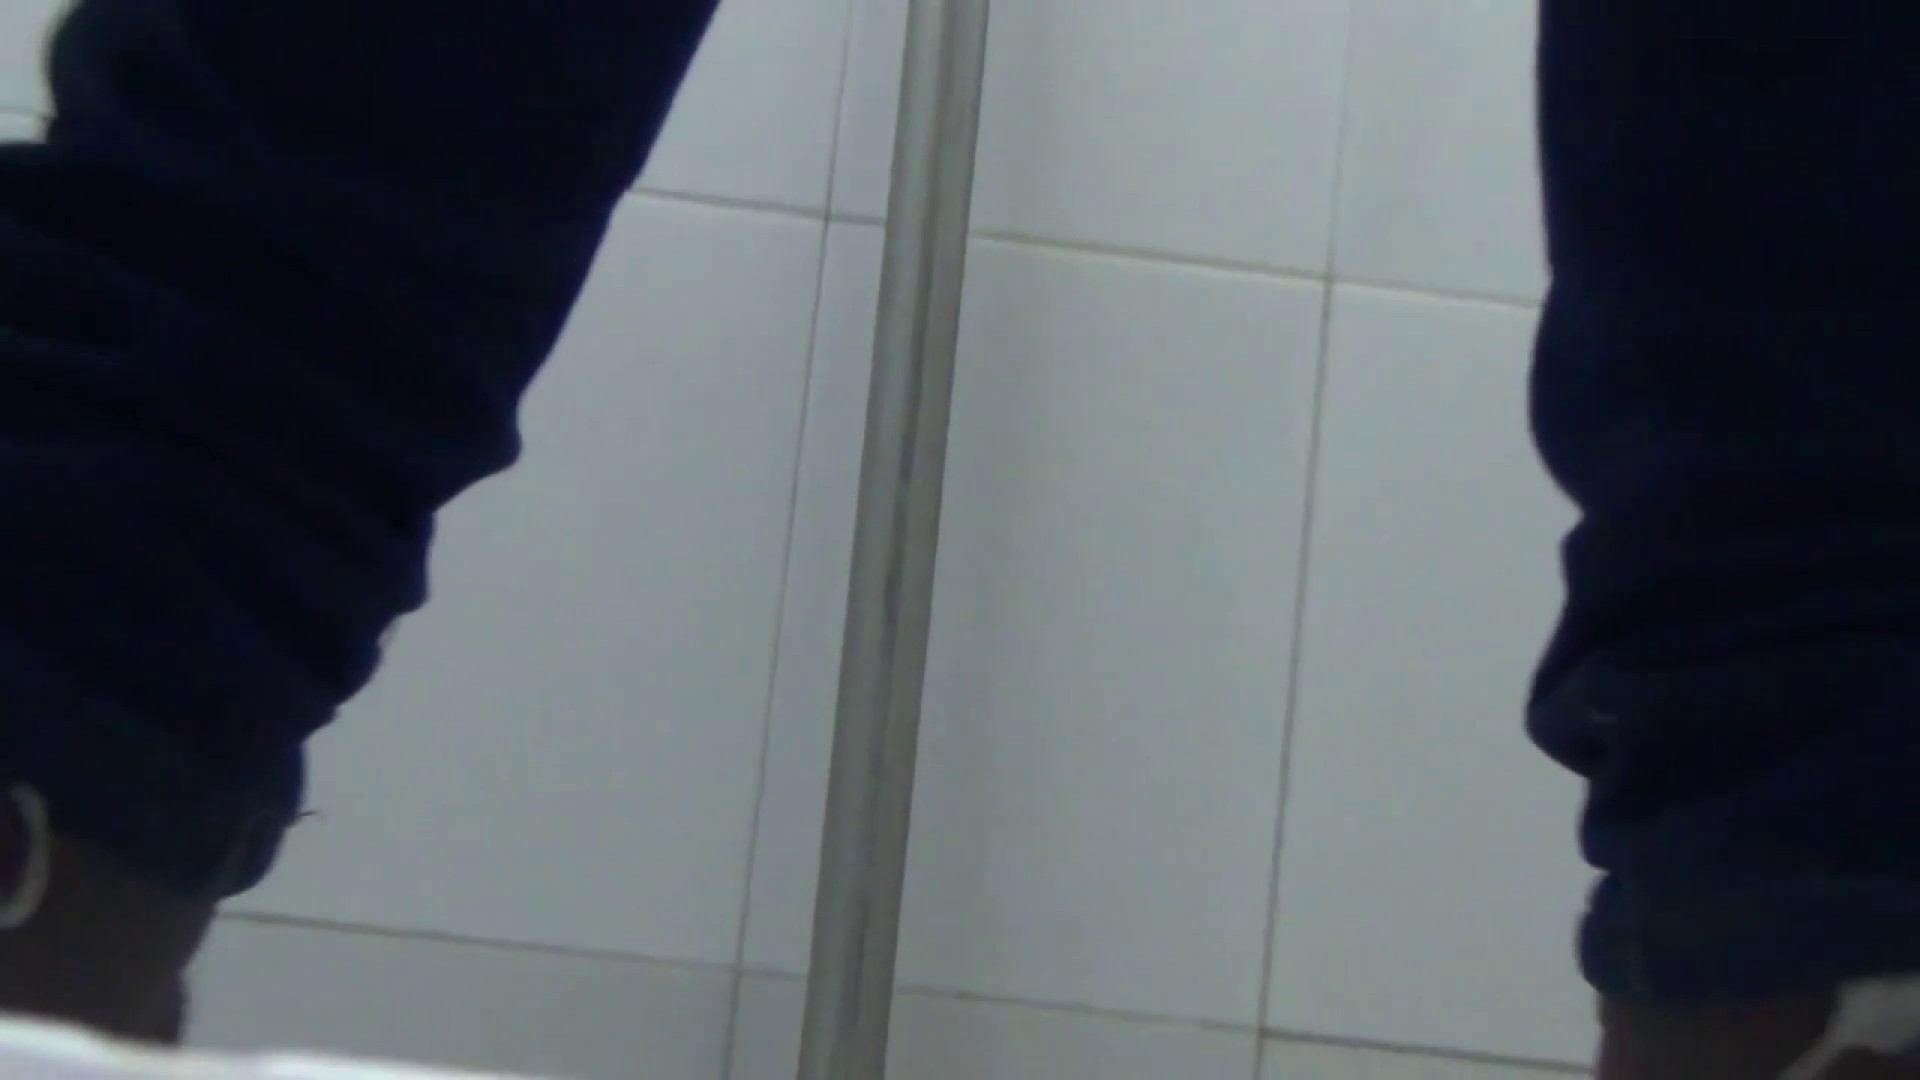 JD盗撮 美女の洗面所の秘密 Vol.47 ギャル攻め AV無料動画キャプチャ 108画像 29